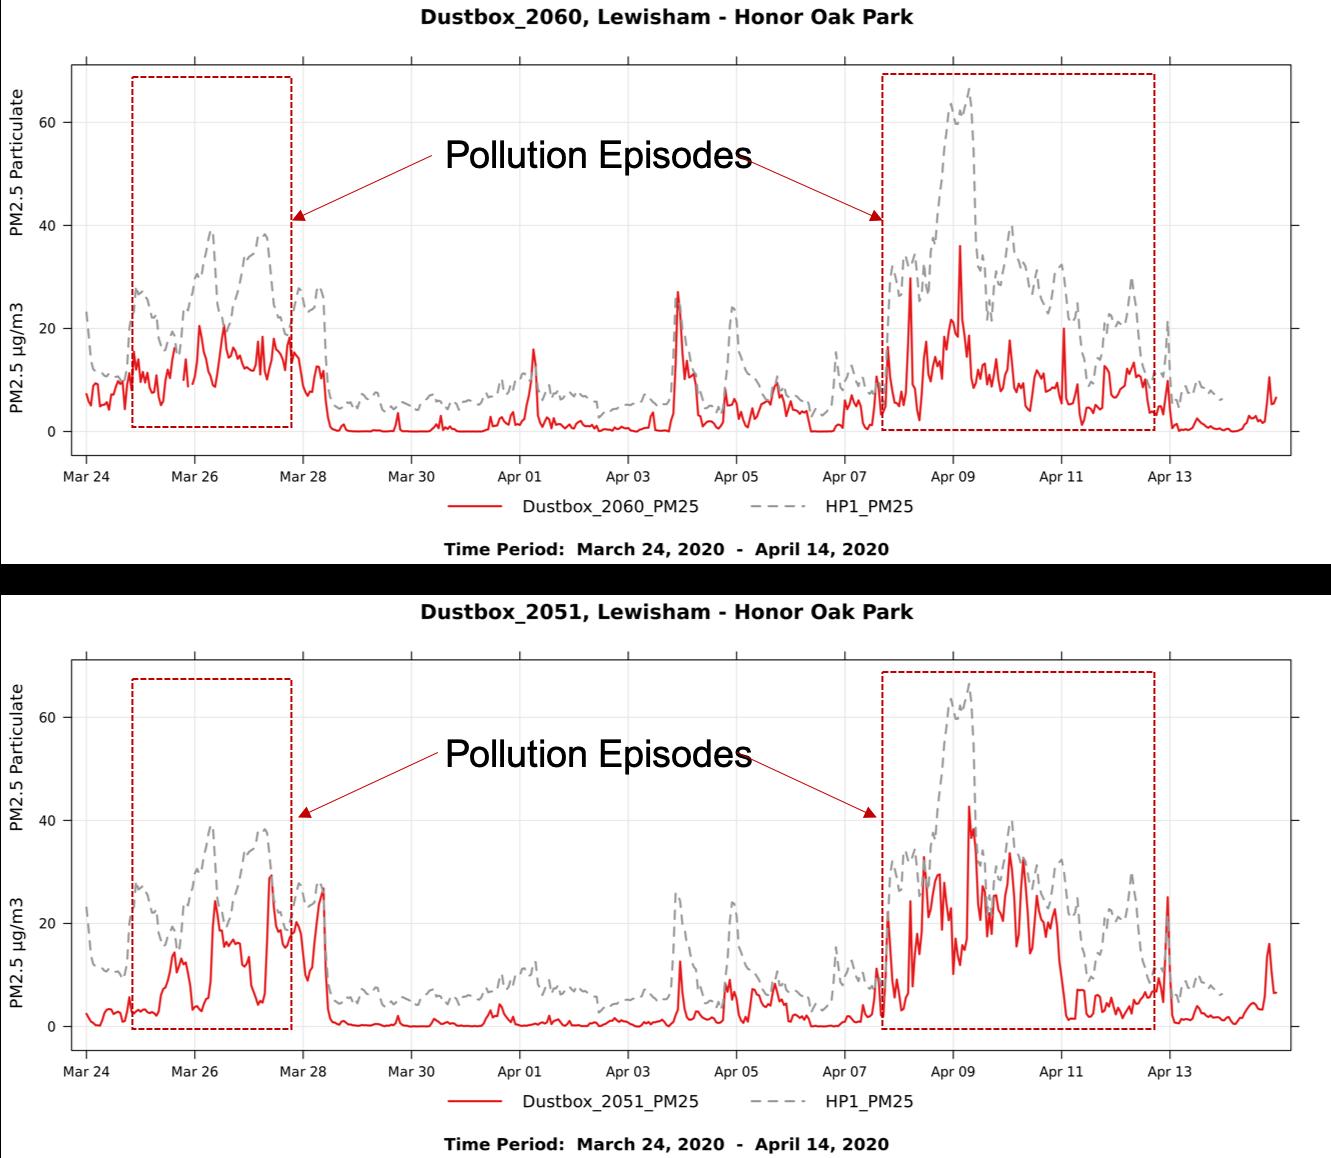 Figure3_BrockleyRise_2051_2060_pollutionEpisodes